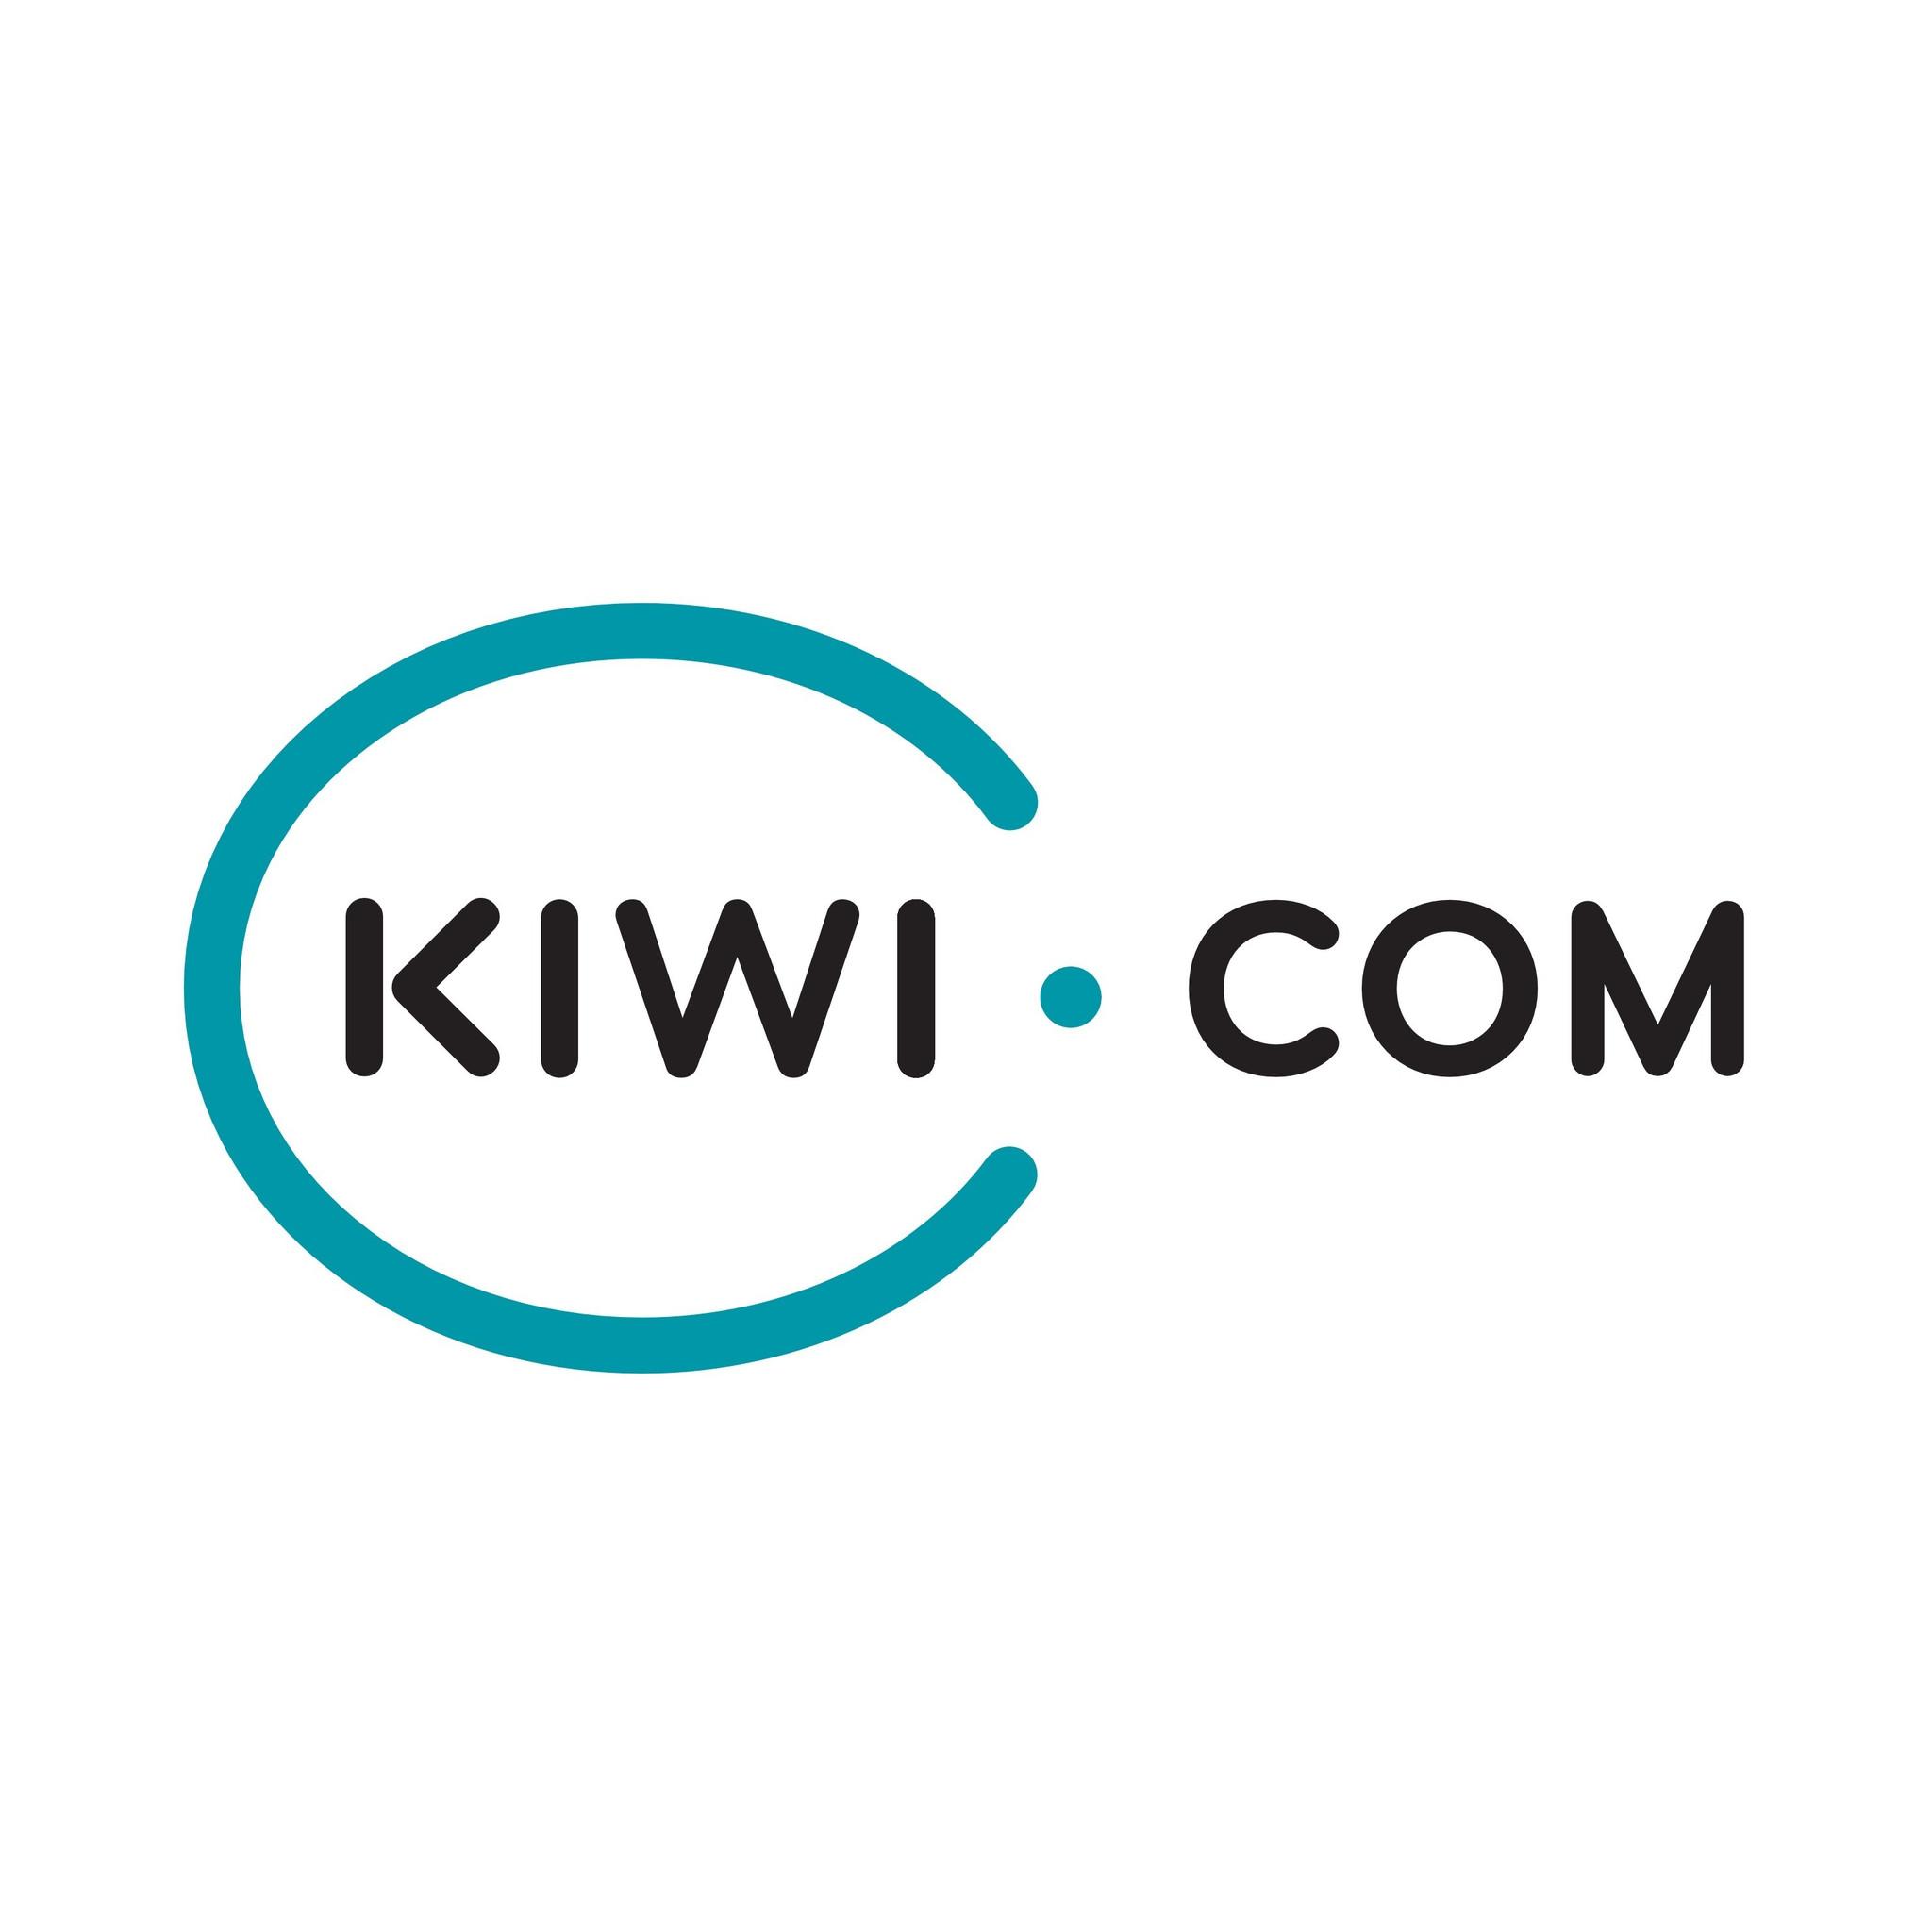 Télephone information entreprise  Kiwi.com